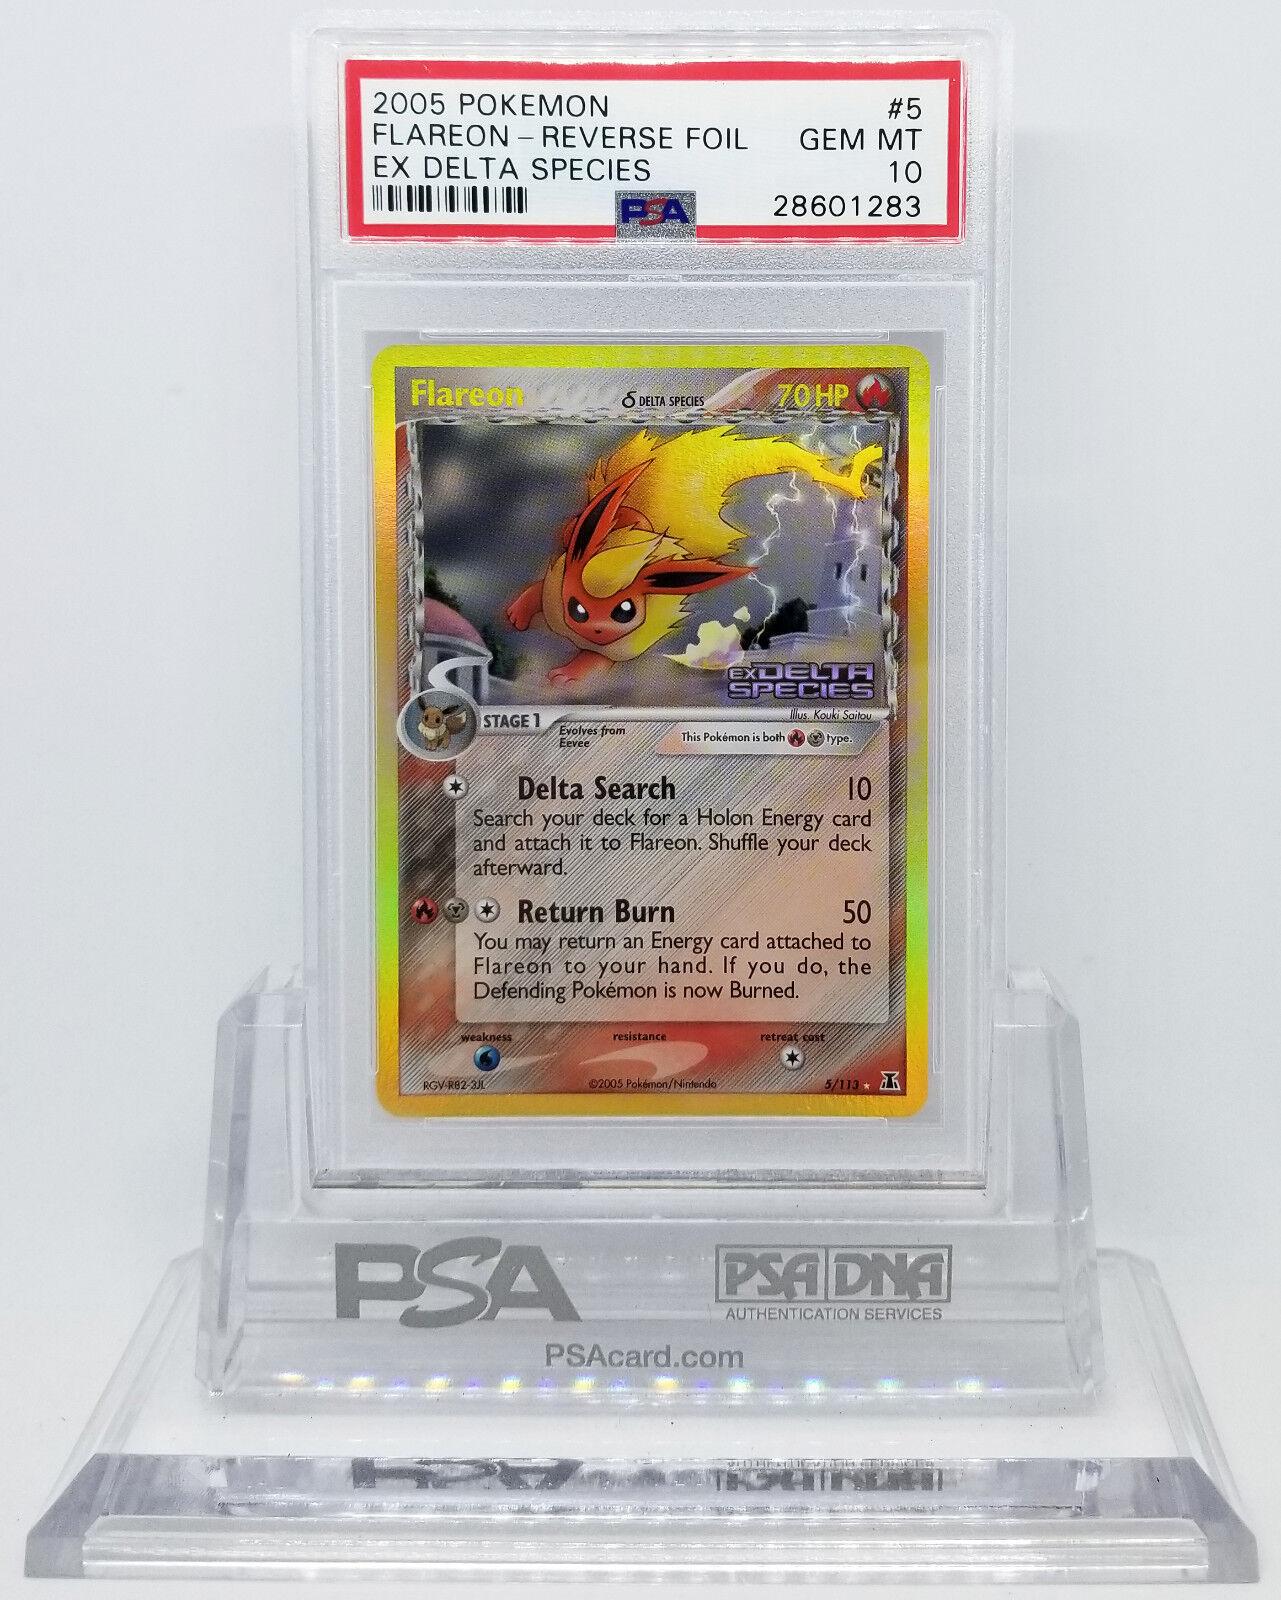 Pokemon EX DELTA SPECIES FLAREON REVERSE REVERSE REVERSE HOLO FOIL CARD PSA 10 GEM MINT  4a75c4